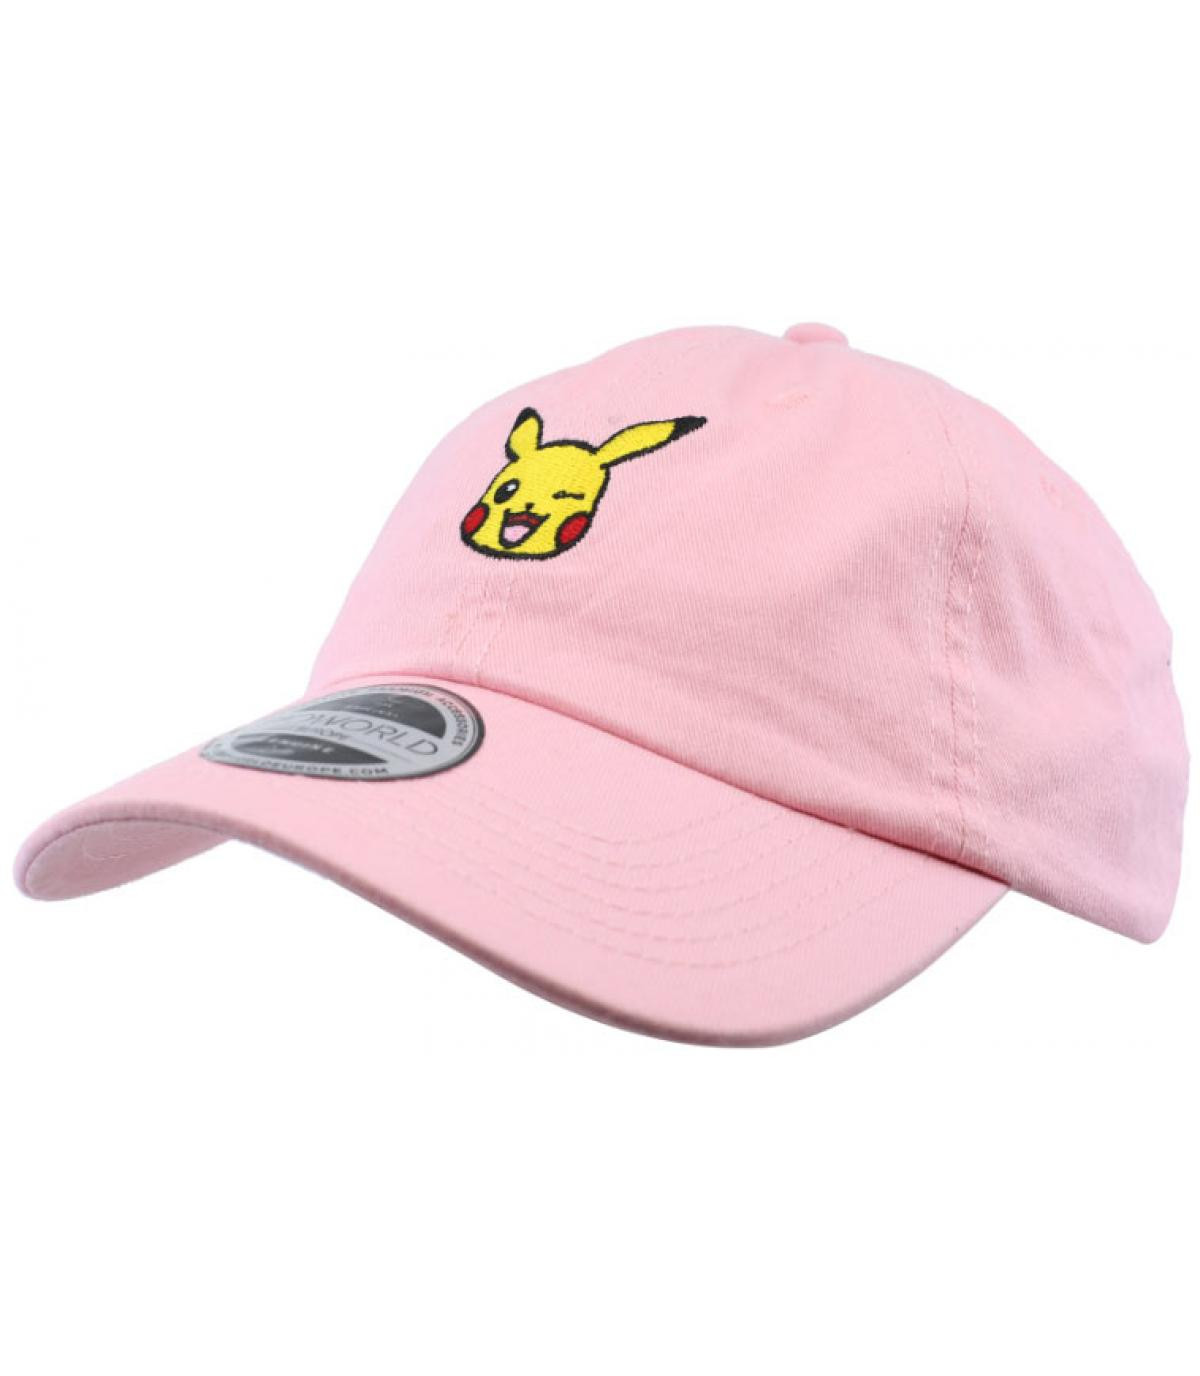 Detalles Pikachu Dad Hat pink imagen 2